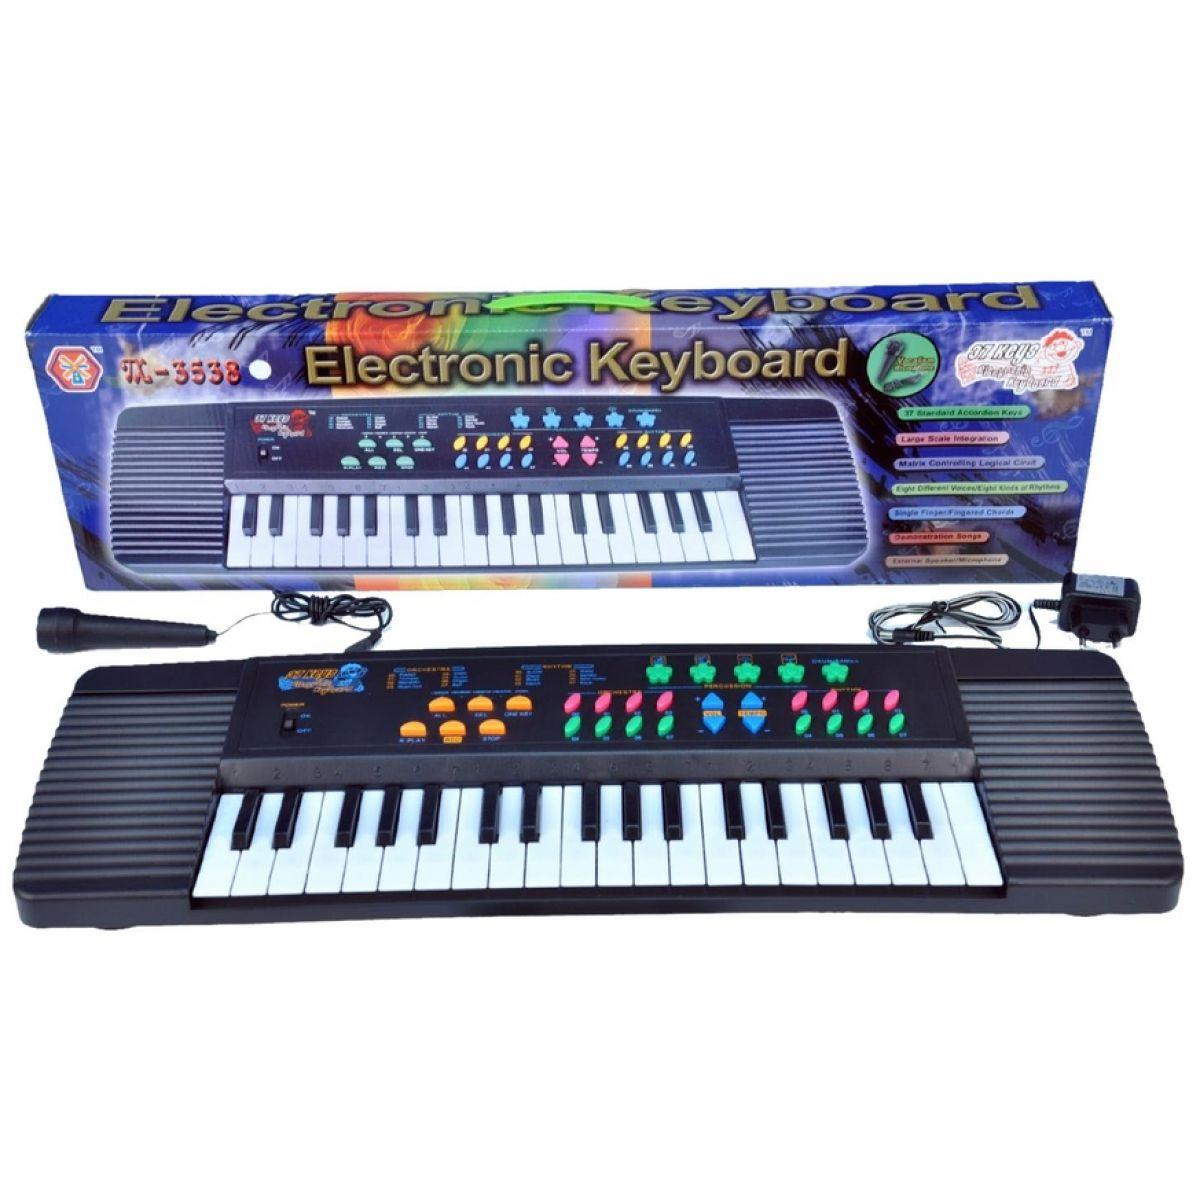 Teddies 61905-DP-1477 - Piánko 37 kláves, 8 zvuků, 8 rytmů 66,5x19,5x6cm na baterie 230V s adaptérem